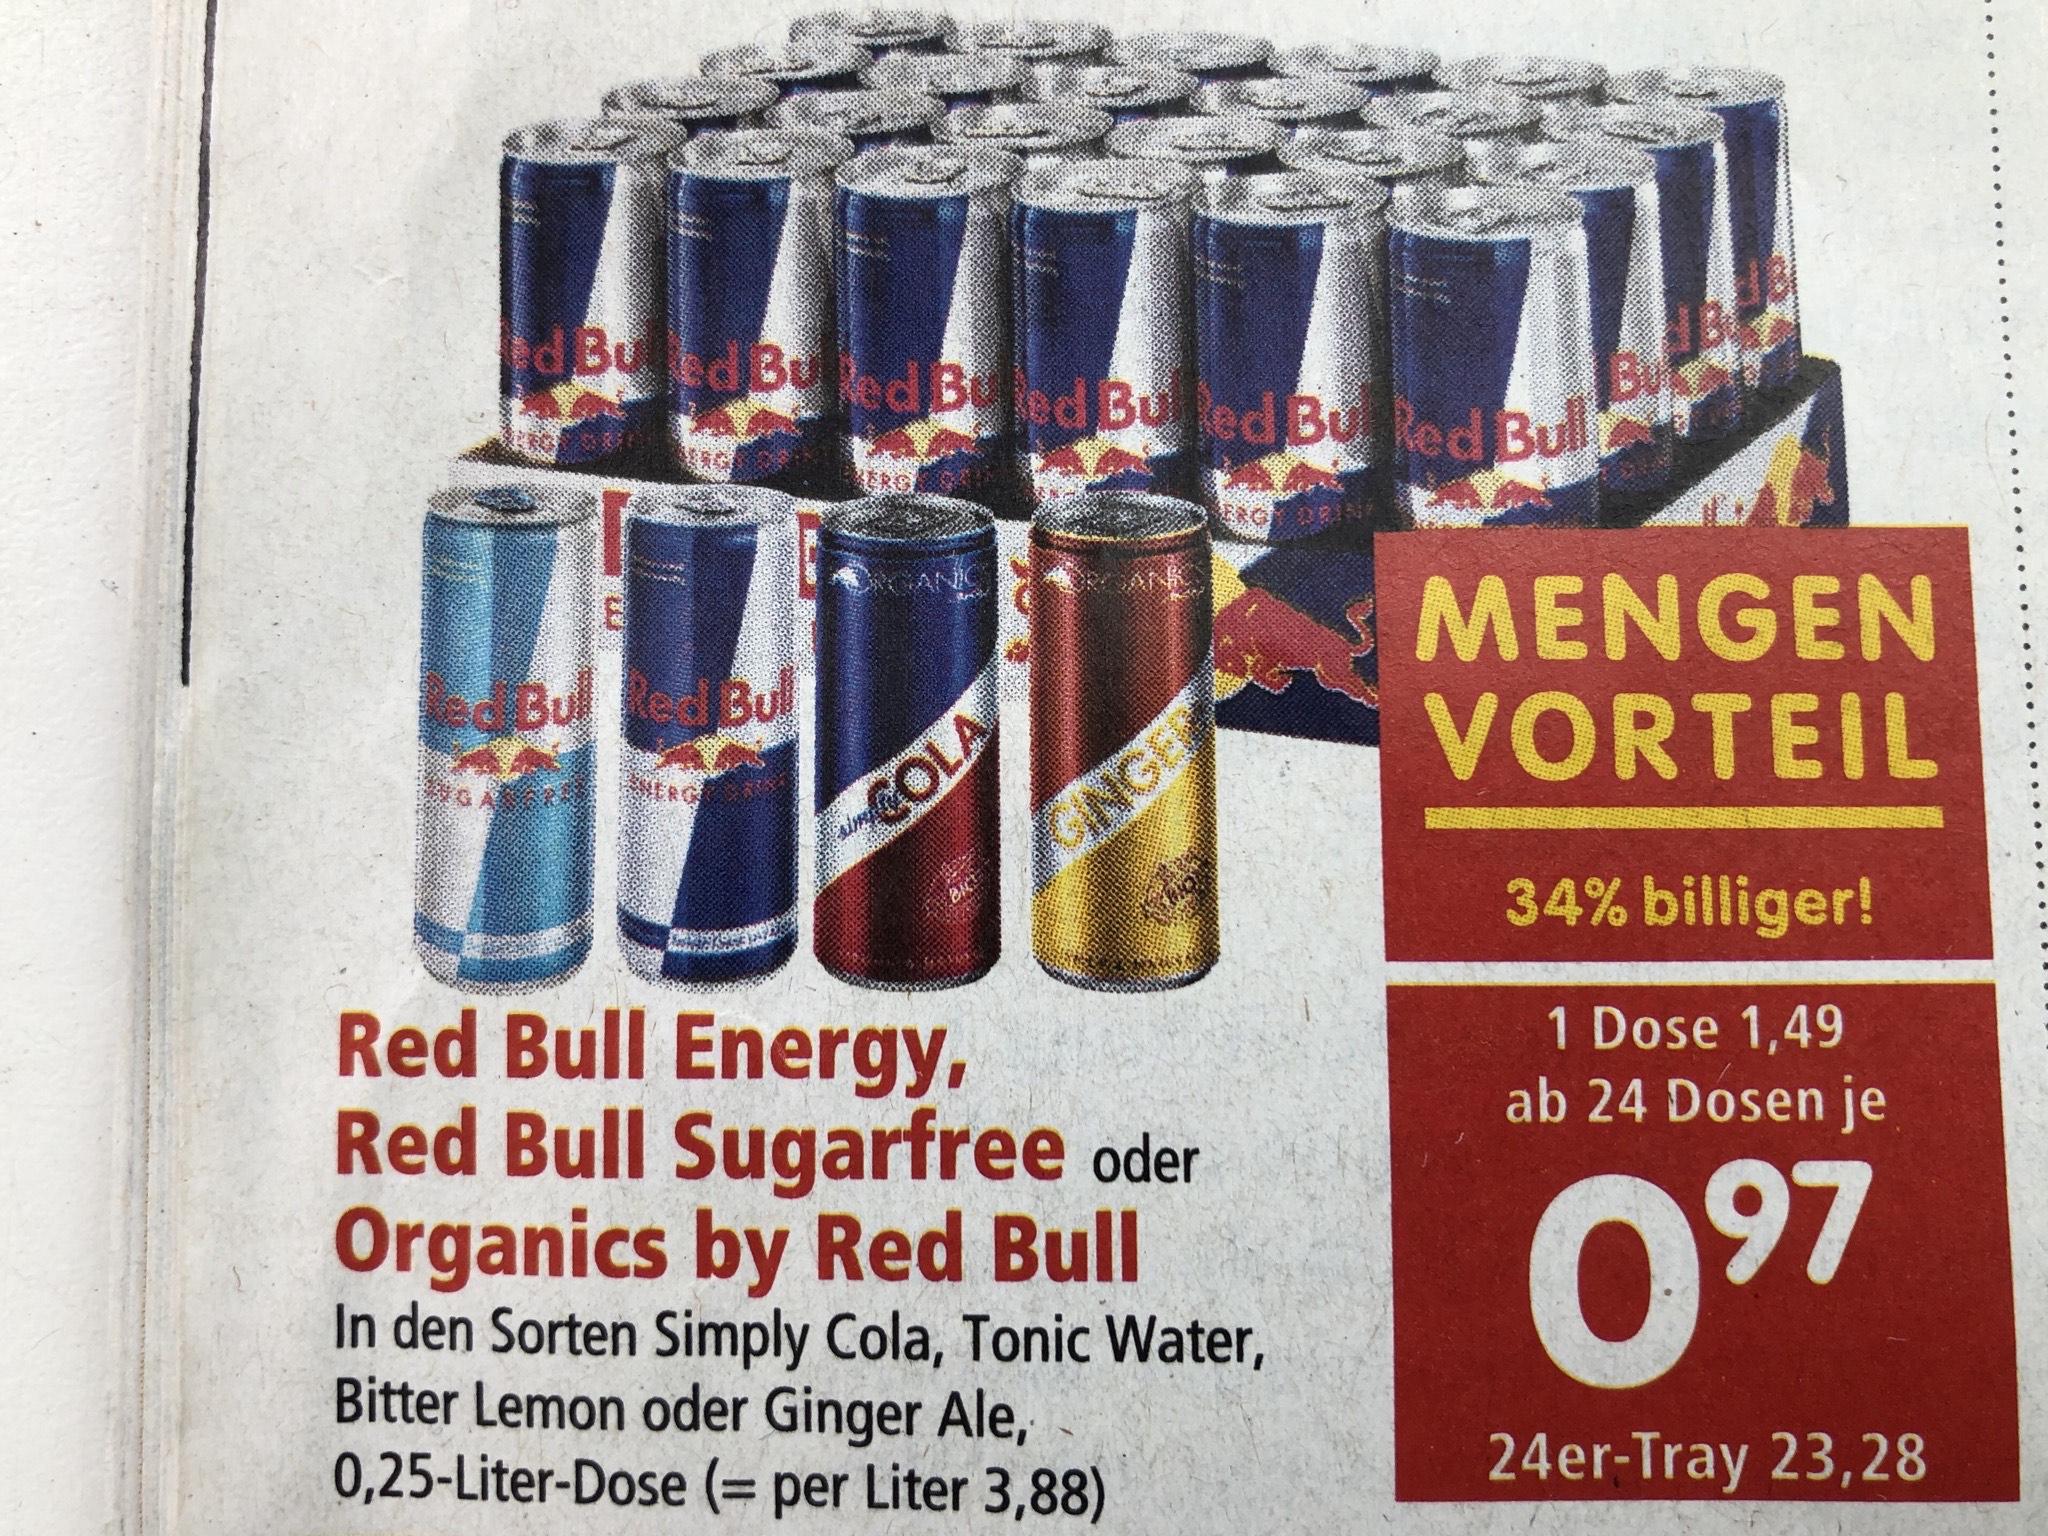 Organics bei Red Bull ## Inter Spar ##